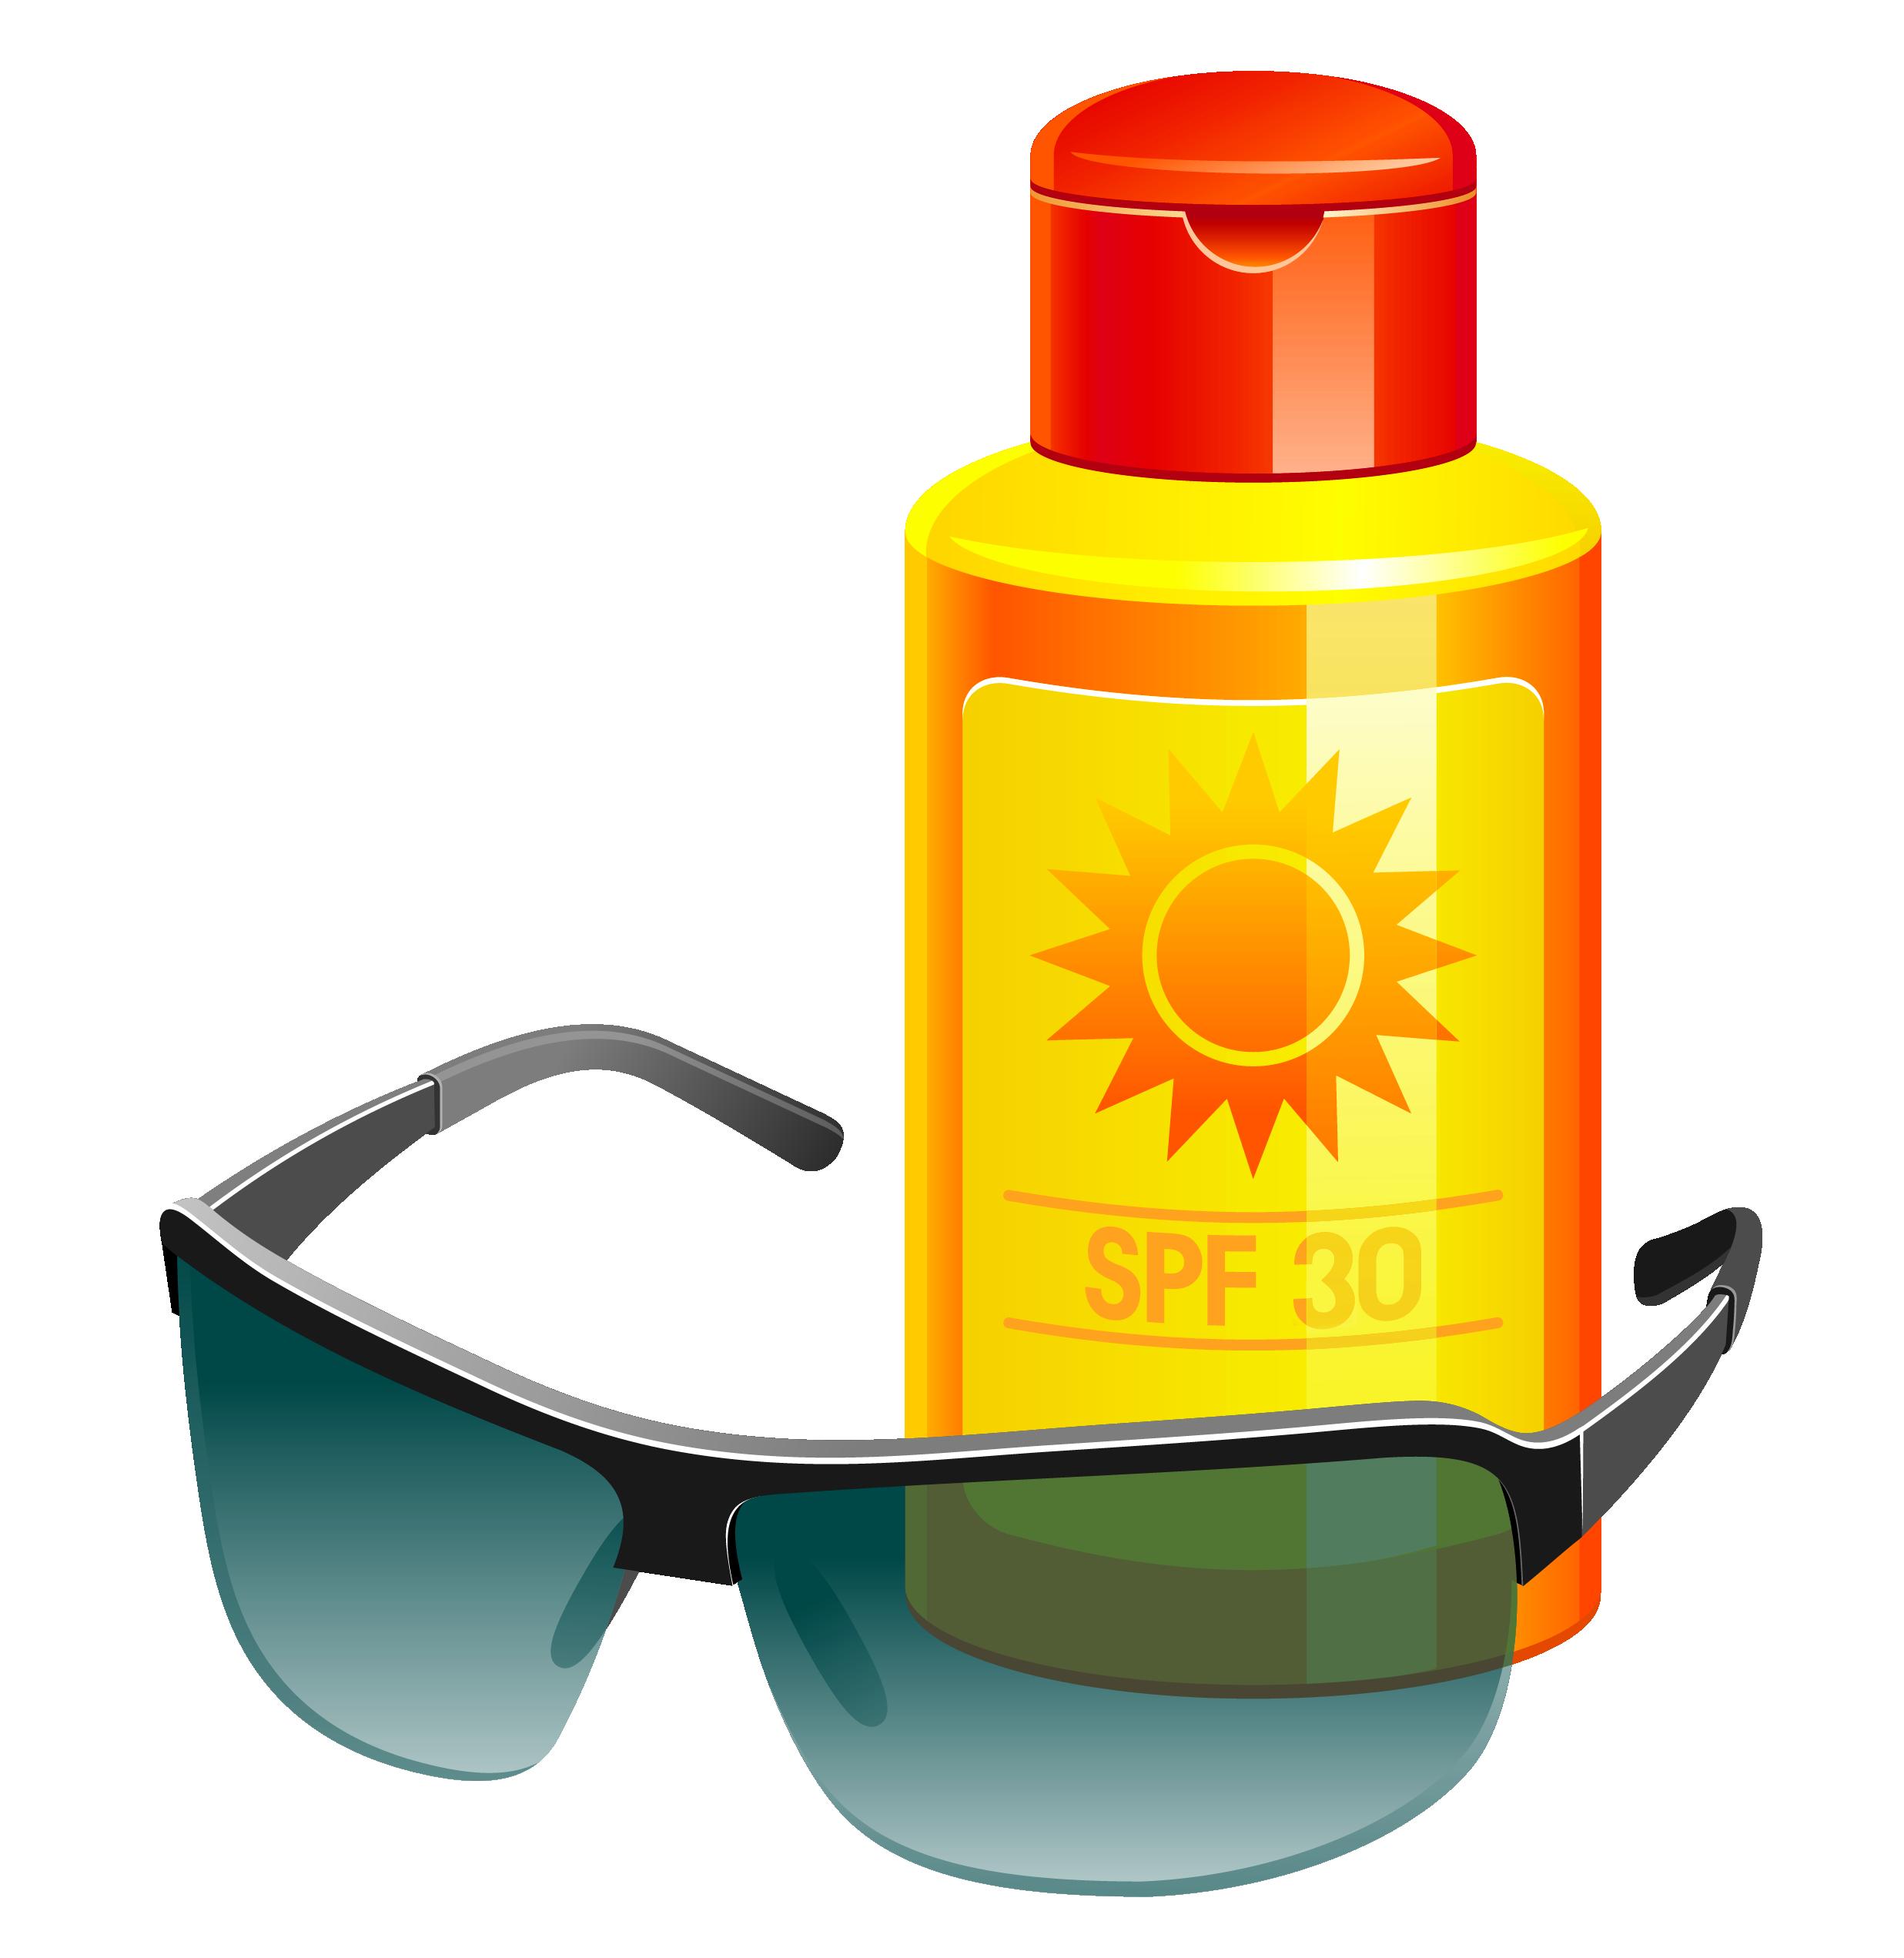 Sunglasses suntan lotion free. Clipart sunshine sunscreen